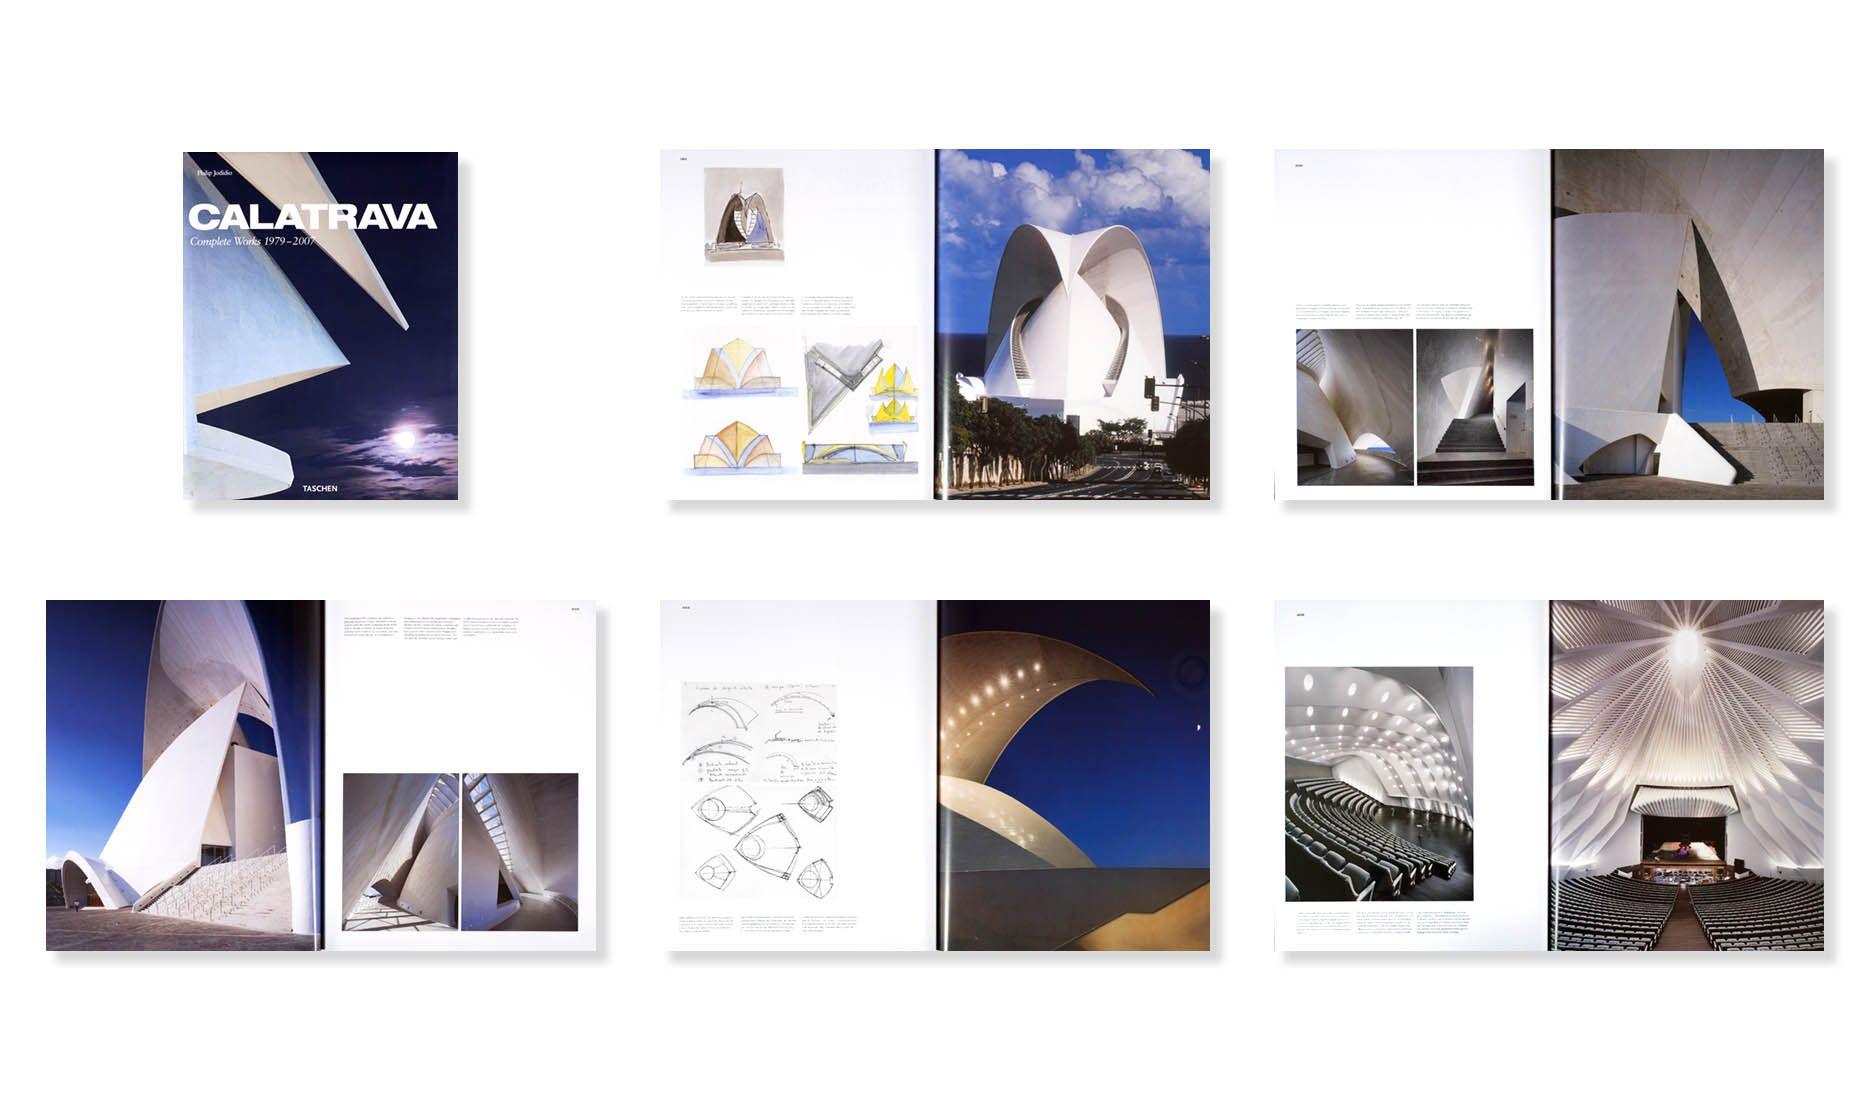 CALATRAVA: COMPLETE WORKS 1979-2007 . TASCHEN . PRINCIPAL CONTRIBUTING PHOTOGRAPHER